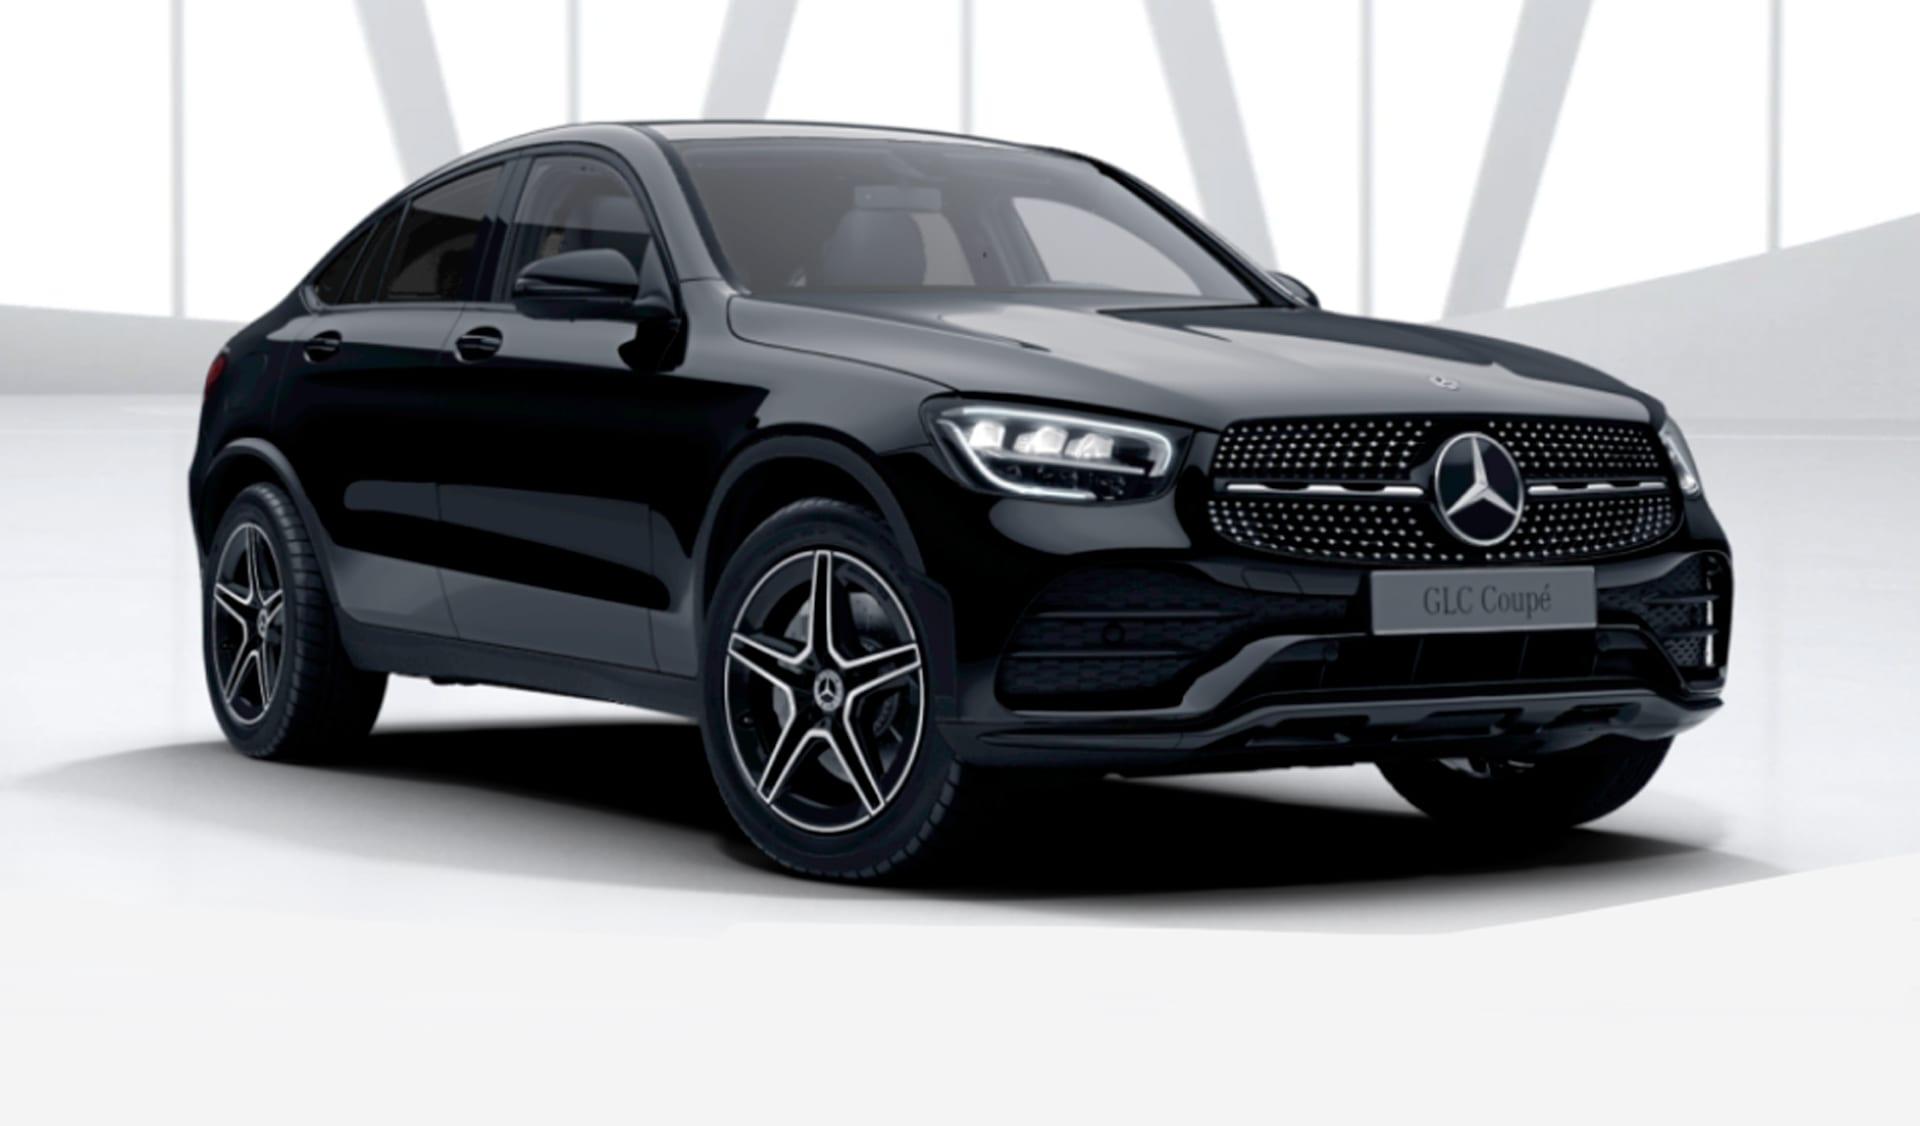 Mercedes-Benz GLC Coupe  0152620269